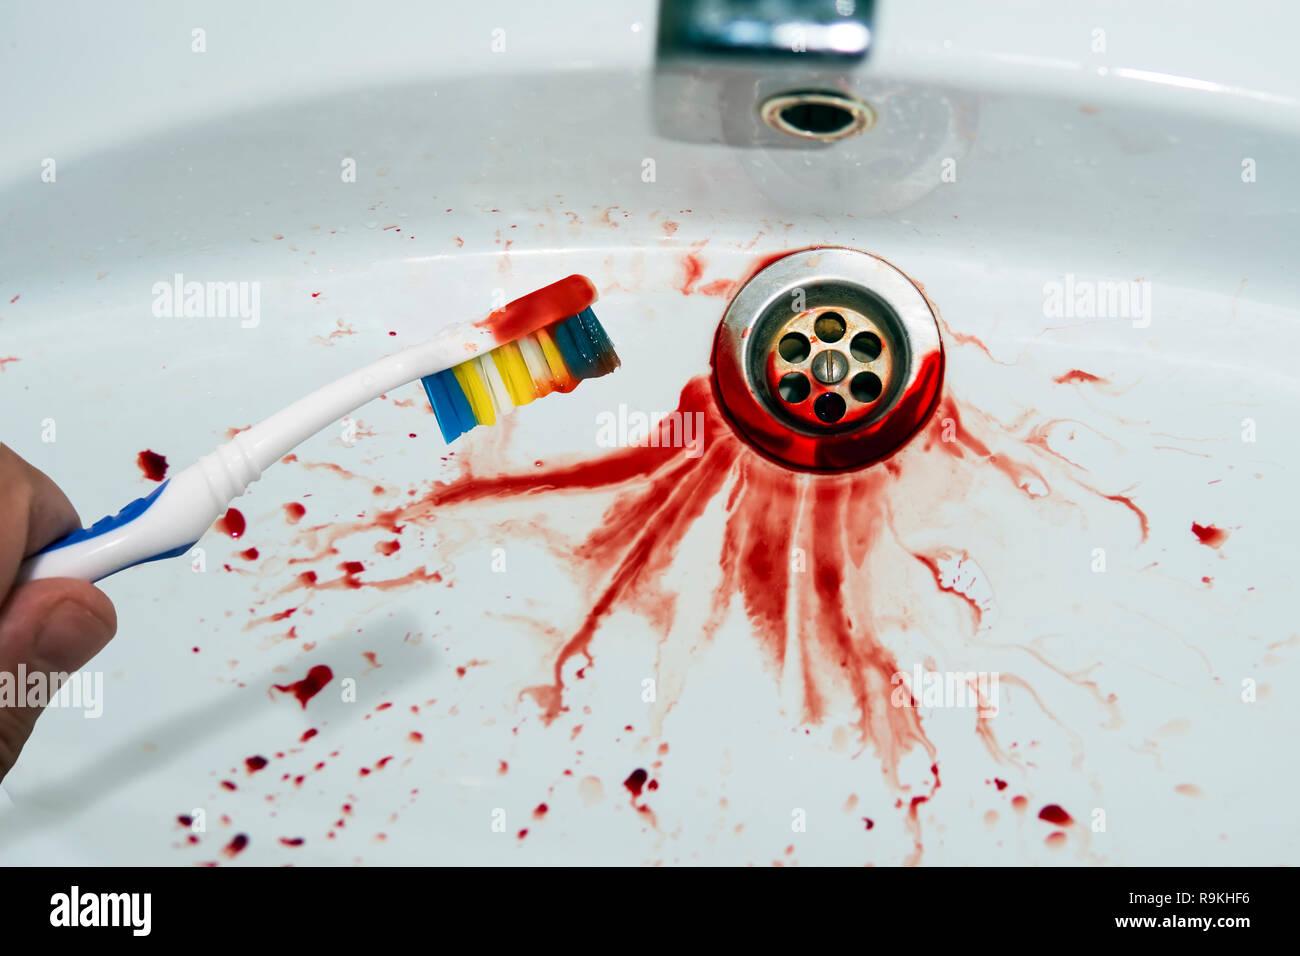 Cierre de cepillo en mano masculina con rastros de sangre en un disipador  spitted sangre antecedentes 26acaeca0128